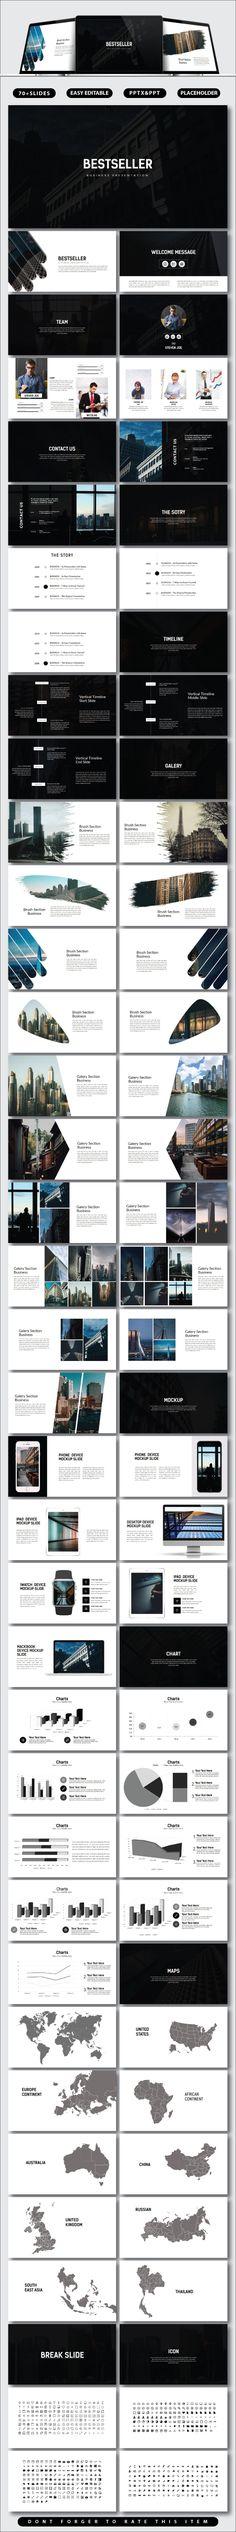 Bestseller Business Presentation - #PowerPoint Templates Presentation Templates